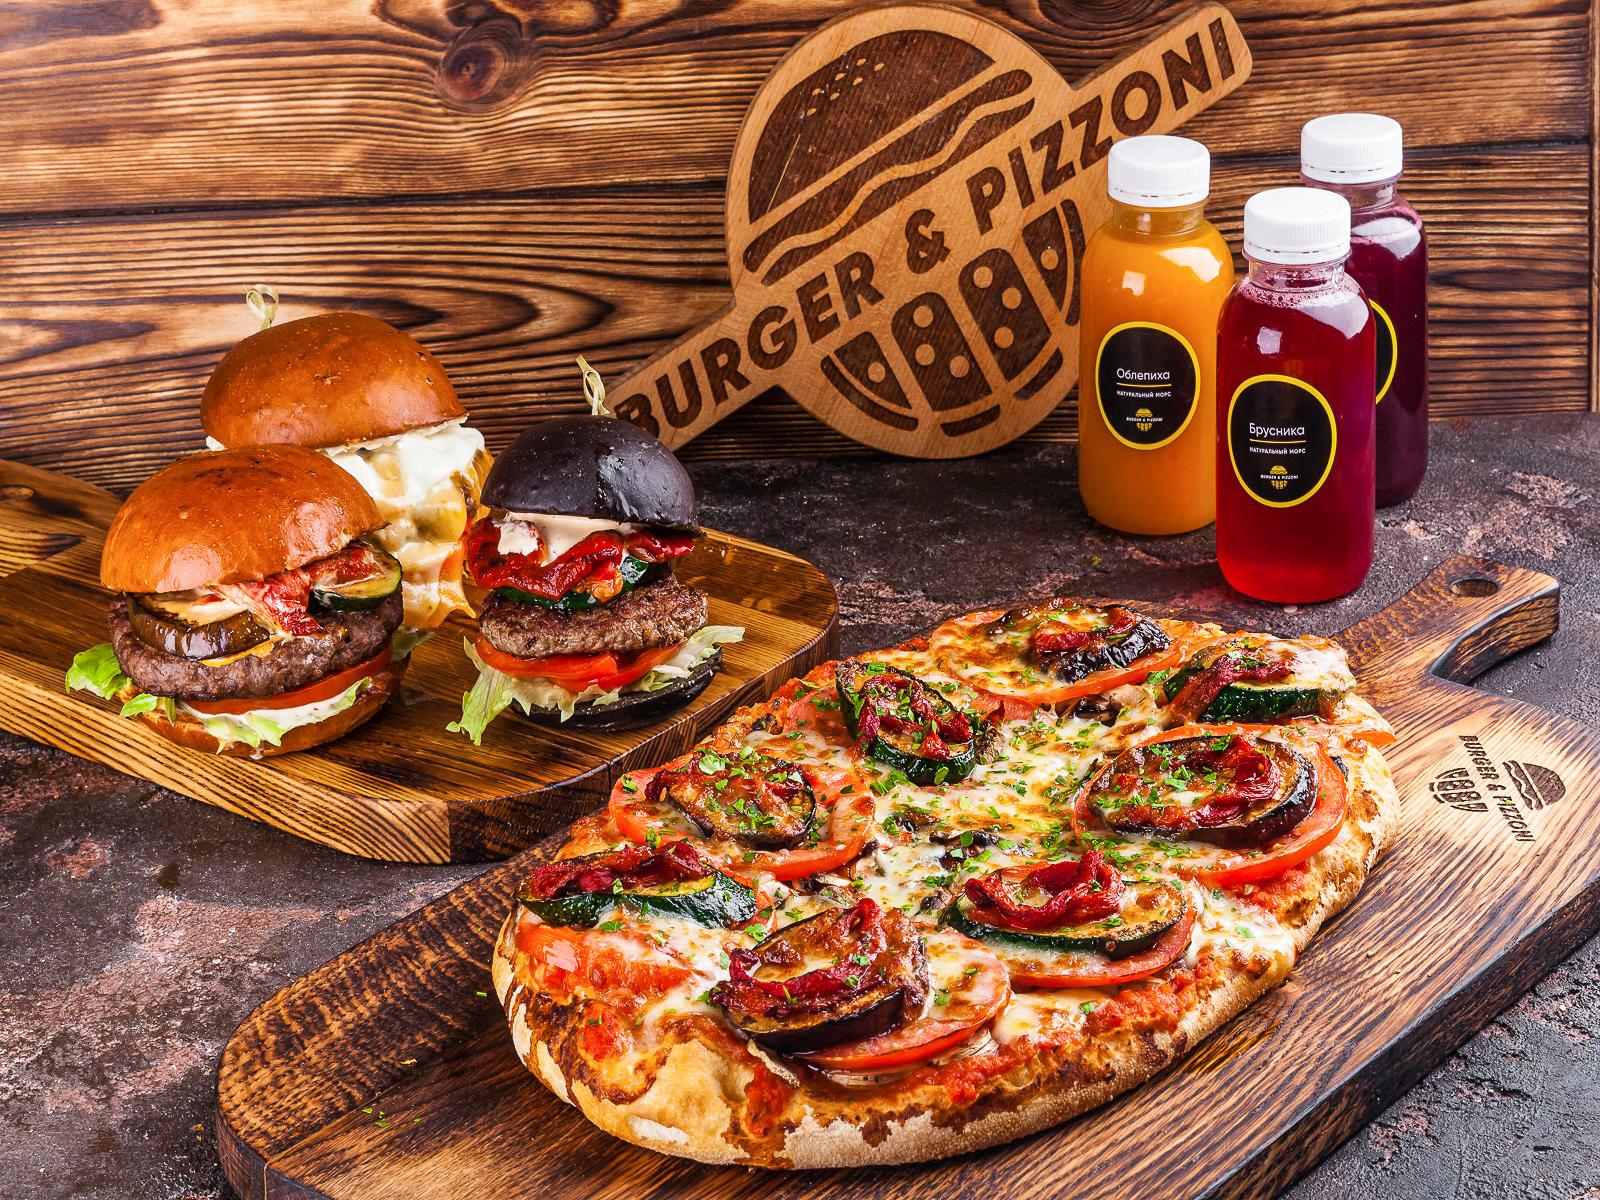 Burger & Pizzoni